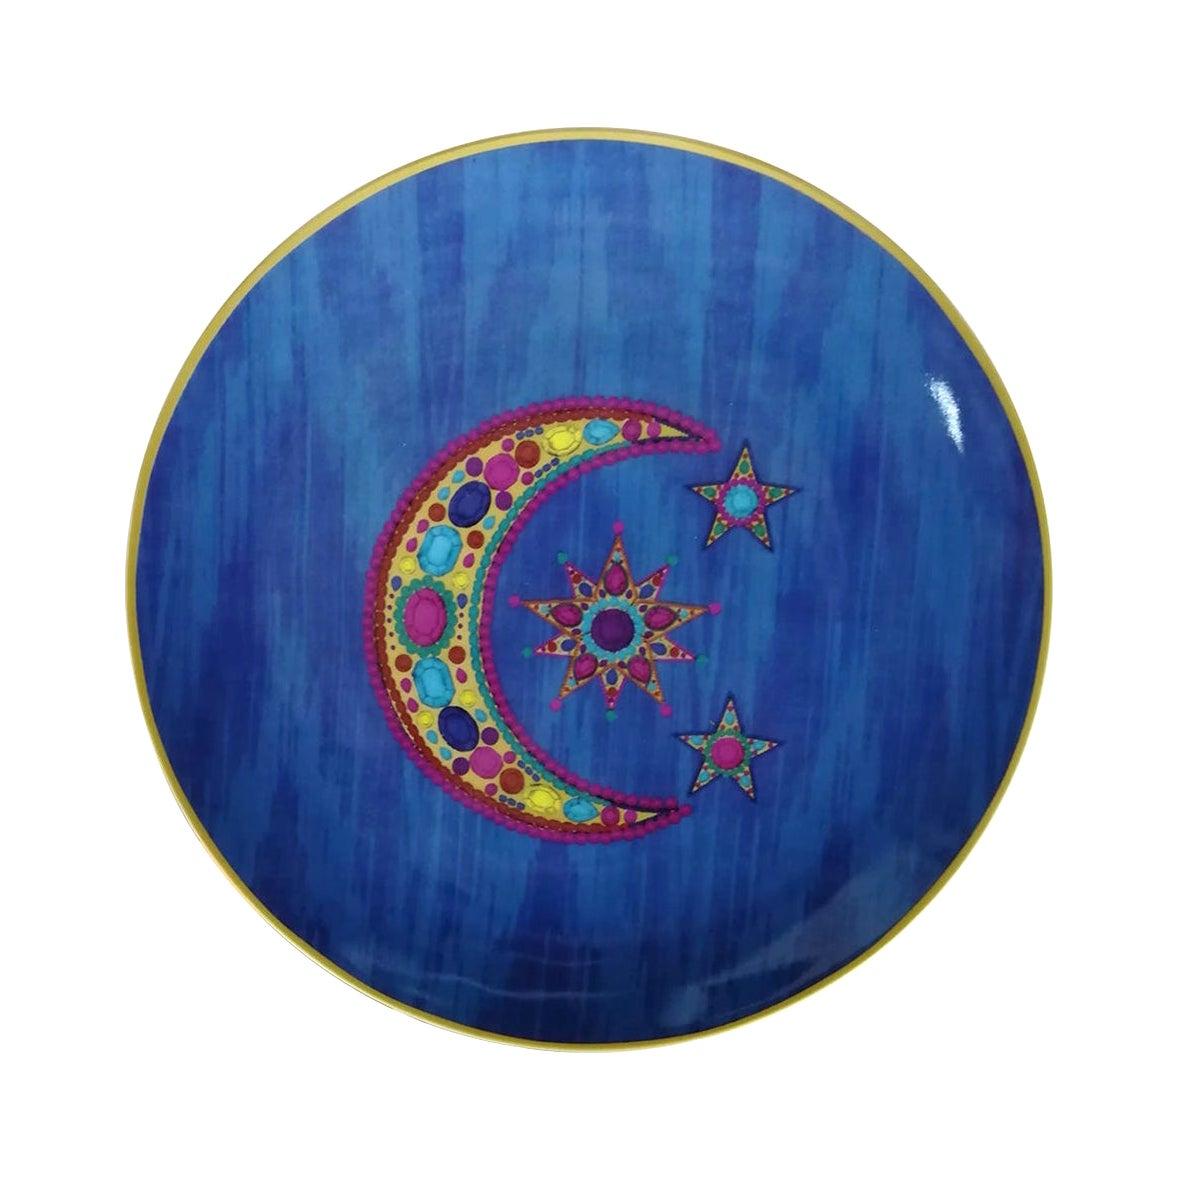 "Les Ottomans ""The Moon Design"" Large Porcelain Plate by Matthew Williamson"